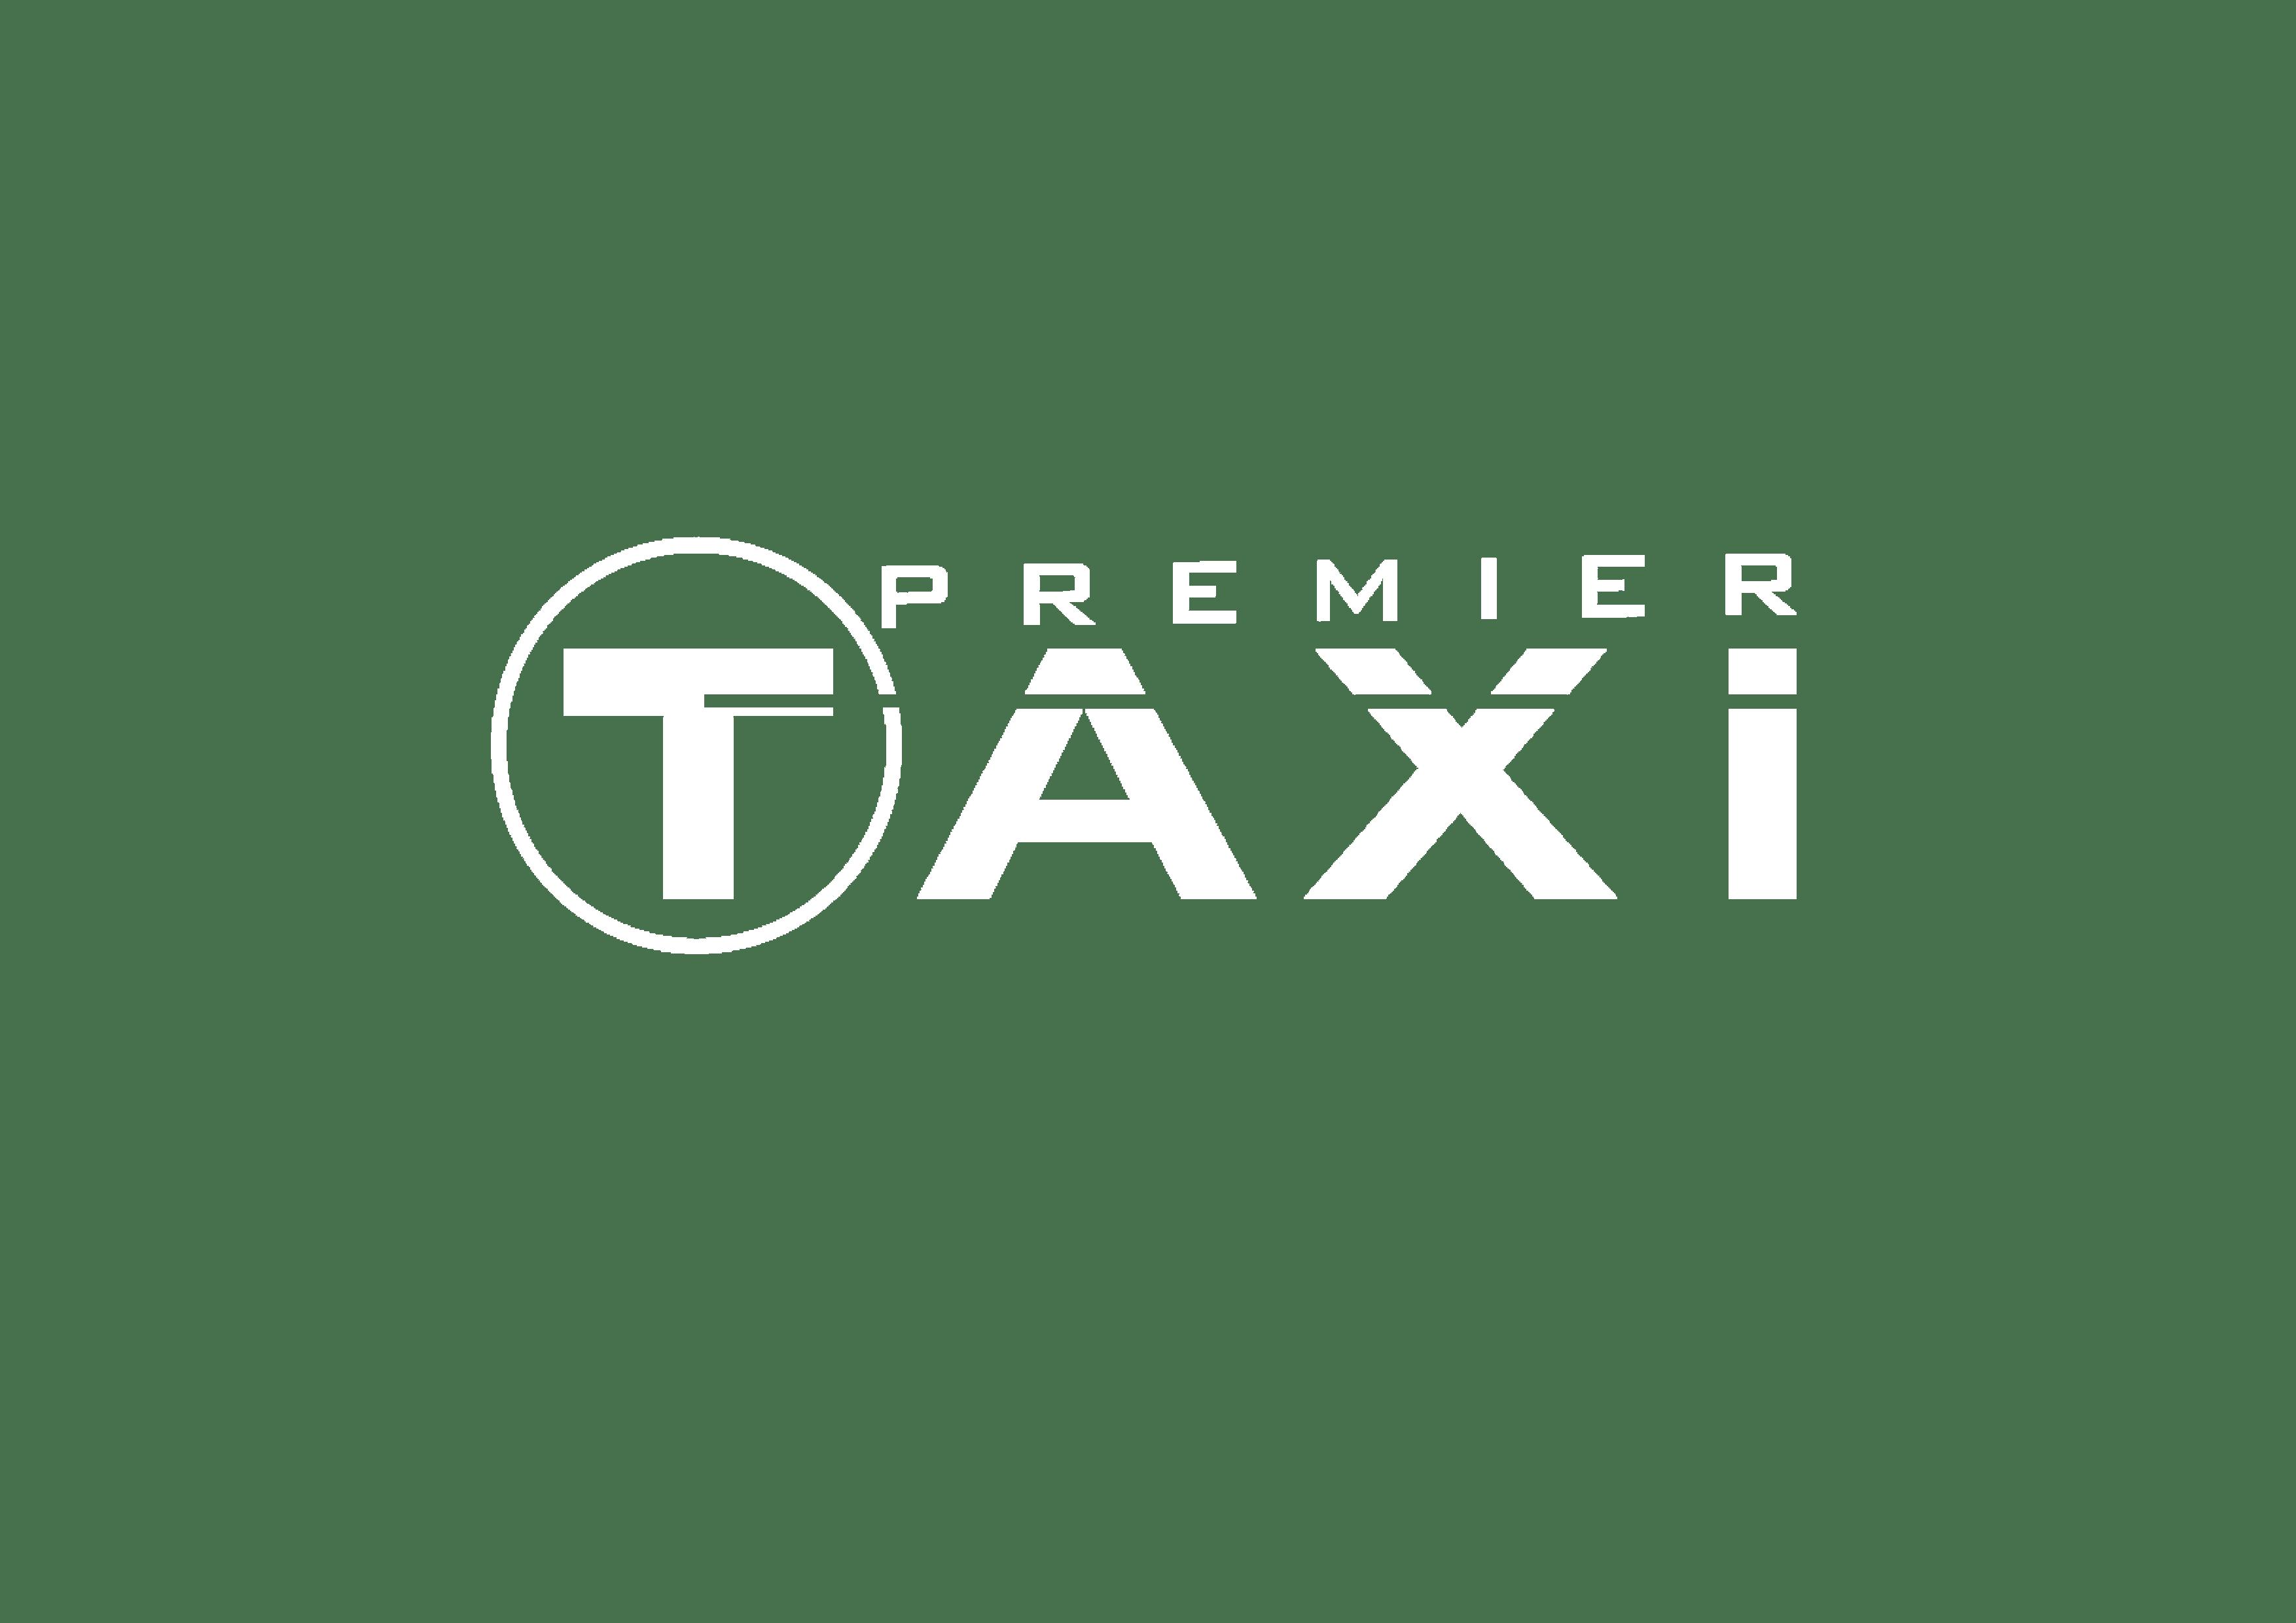 premier taxi logo